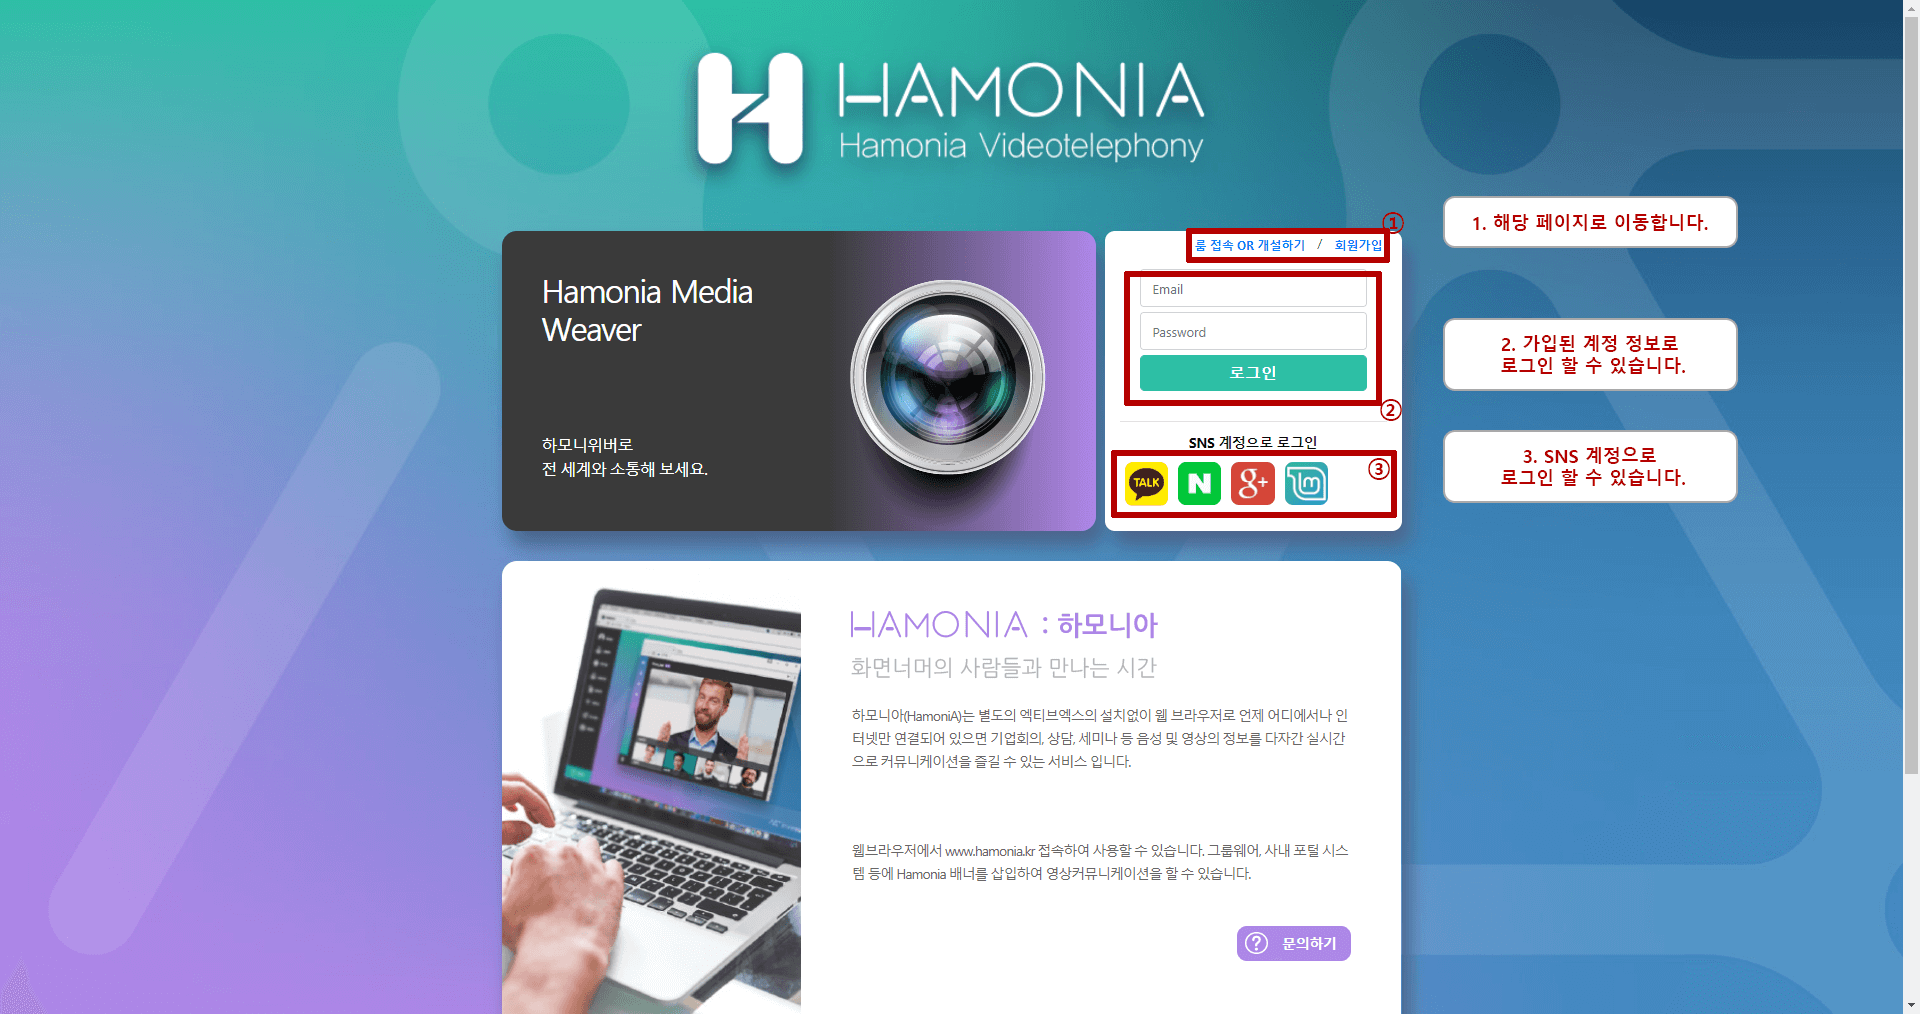 hamonia_renew_02_0.png